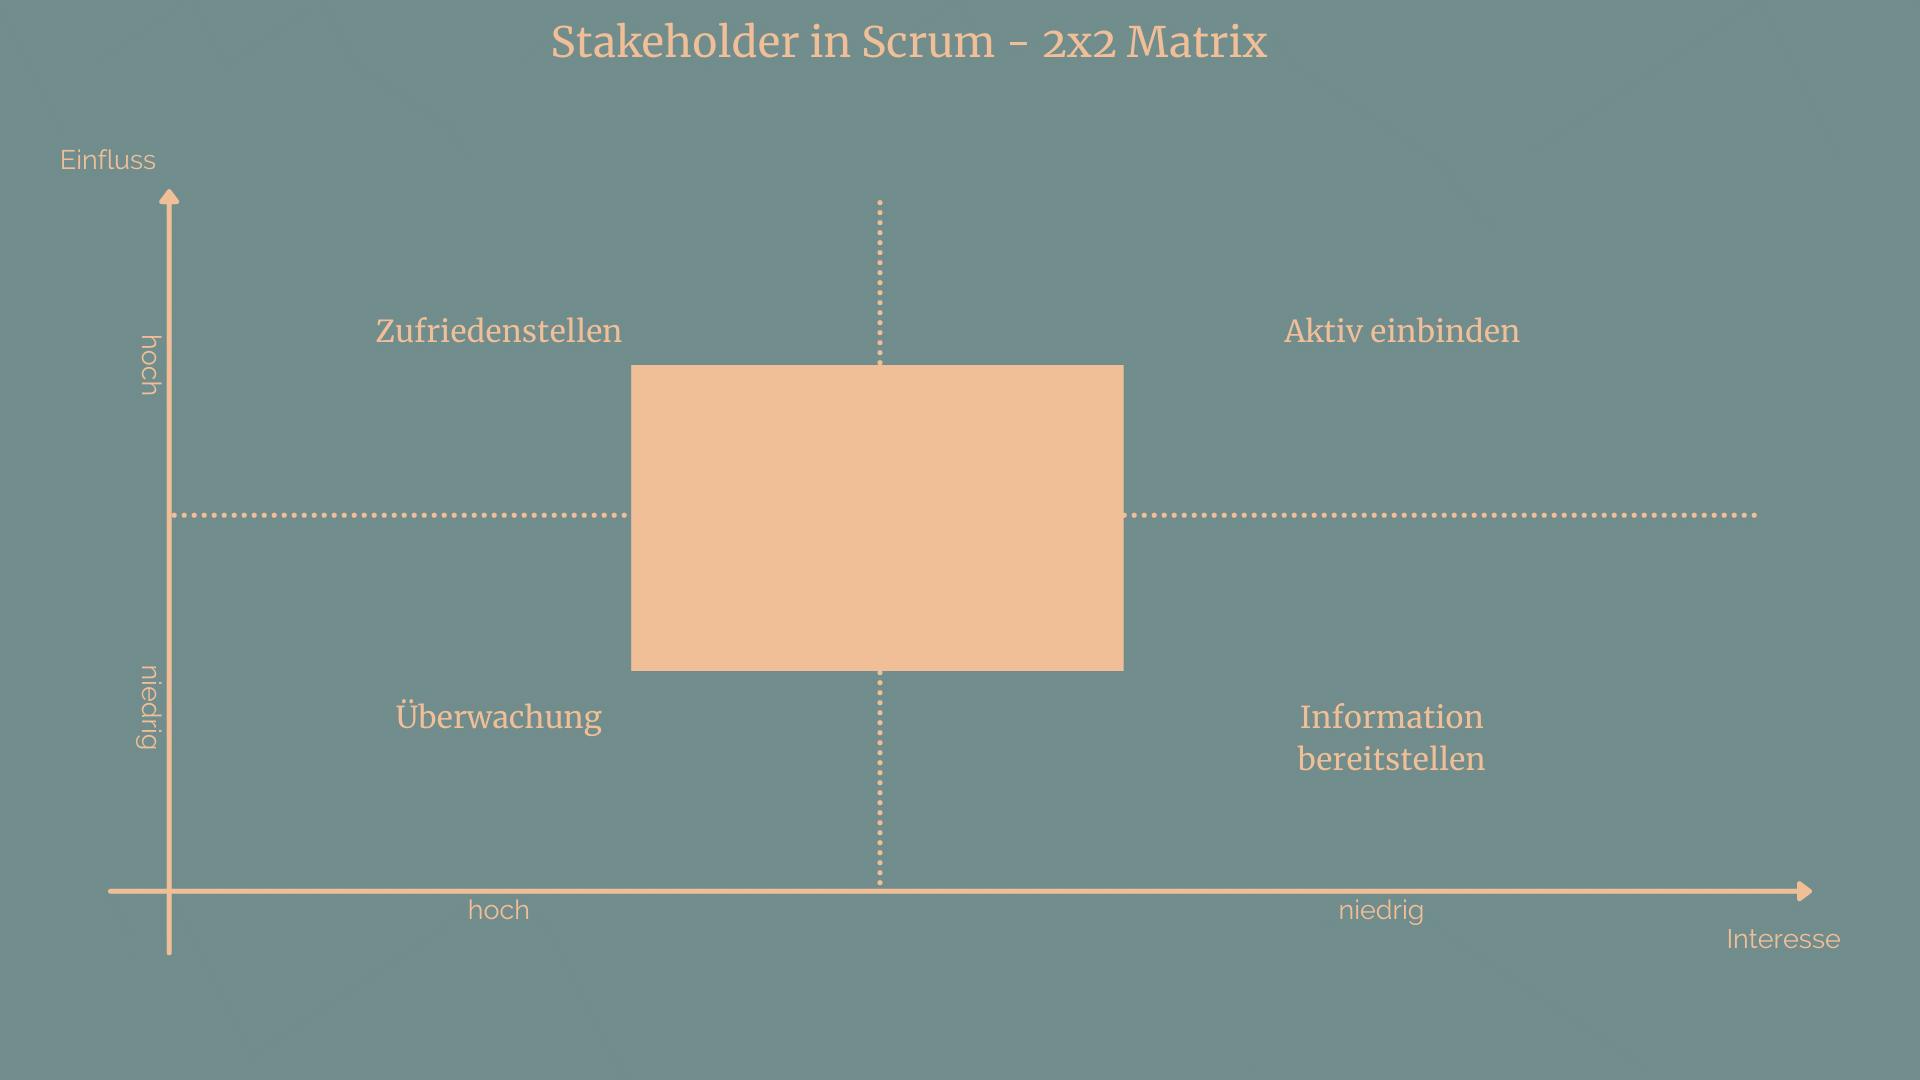 Stakeholder in Scrum - Matrix